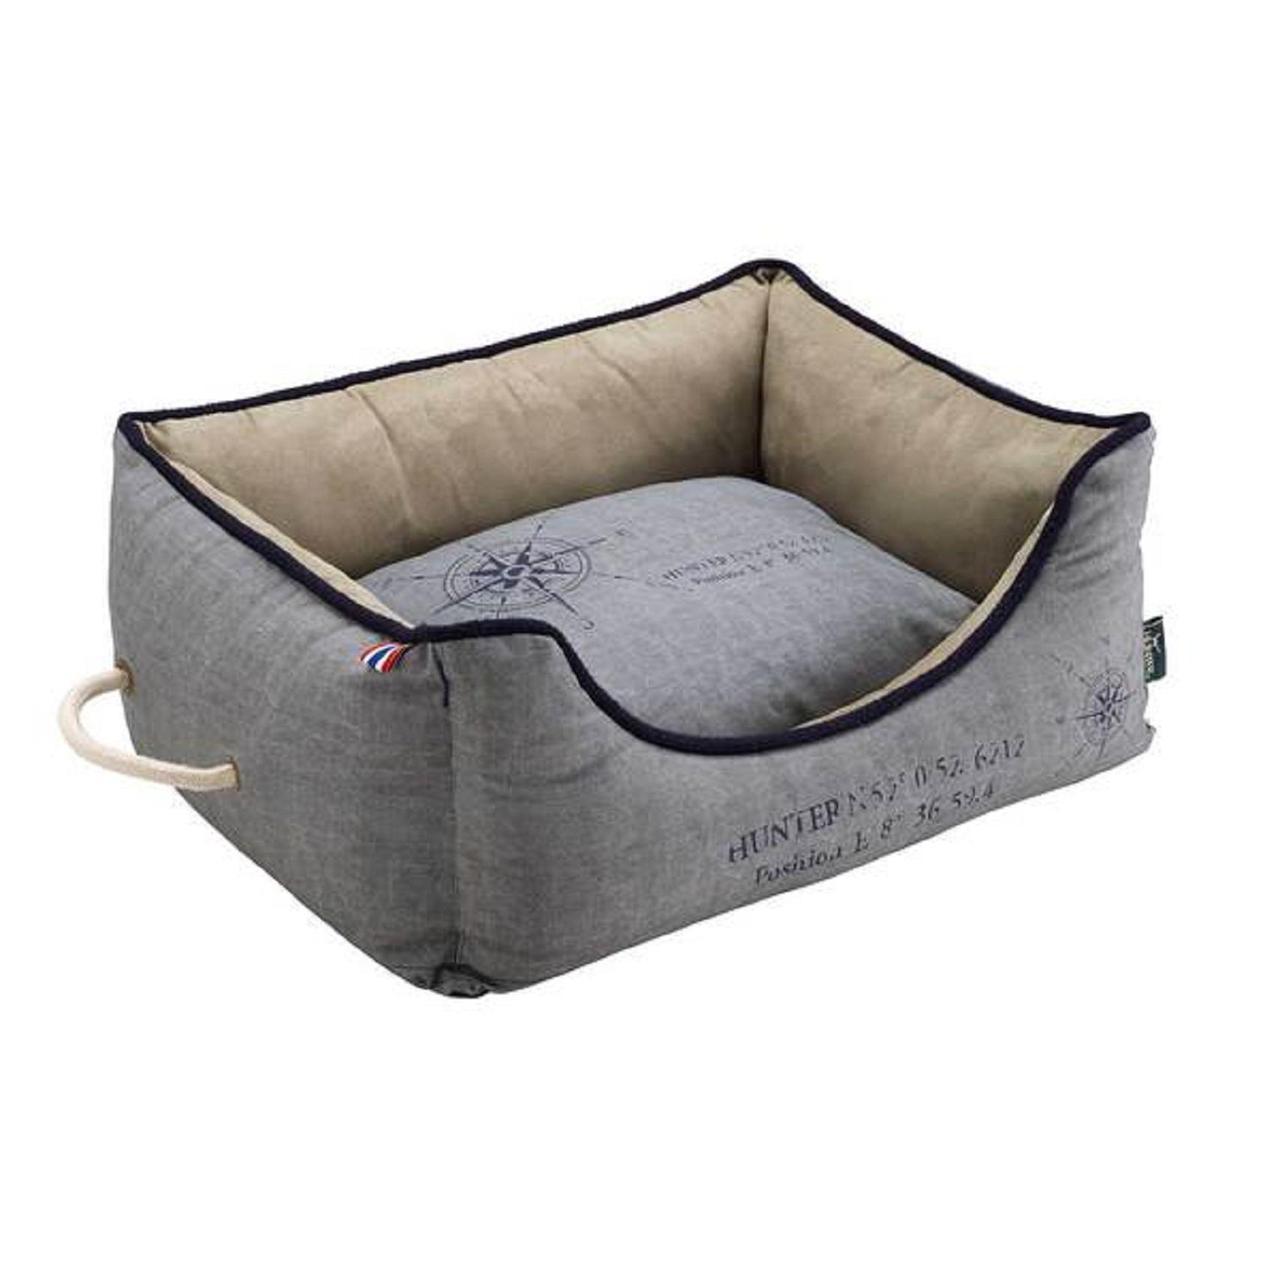 An image of Hunter Dog Sofa List 60x40cm